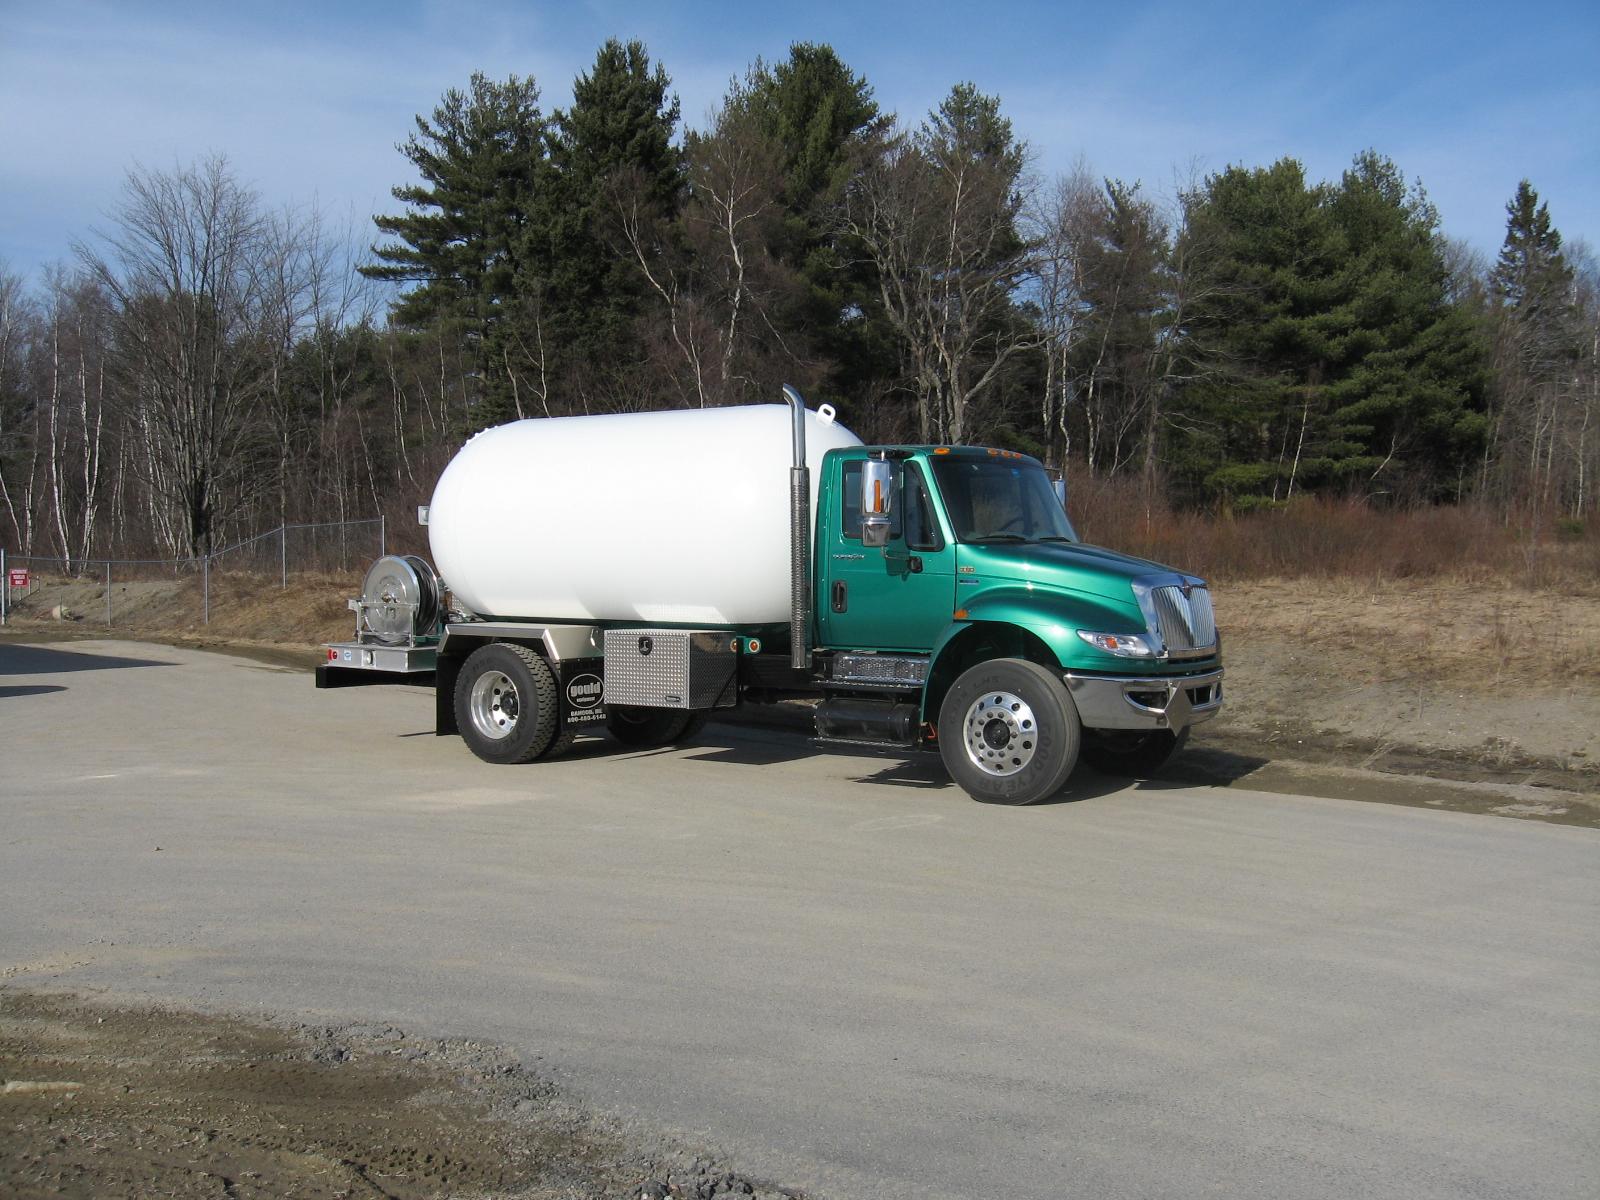 Propane truck, new